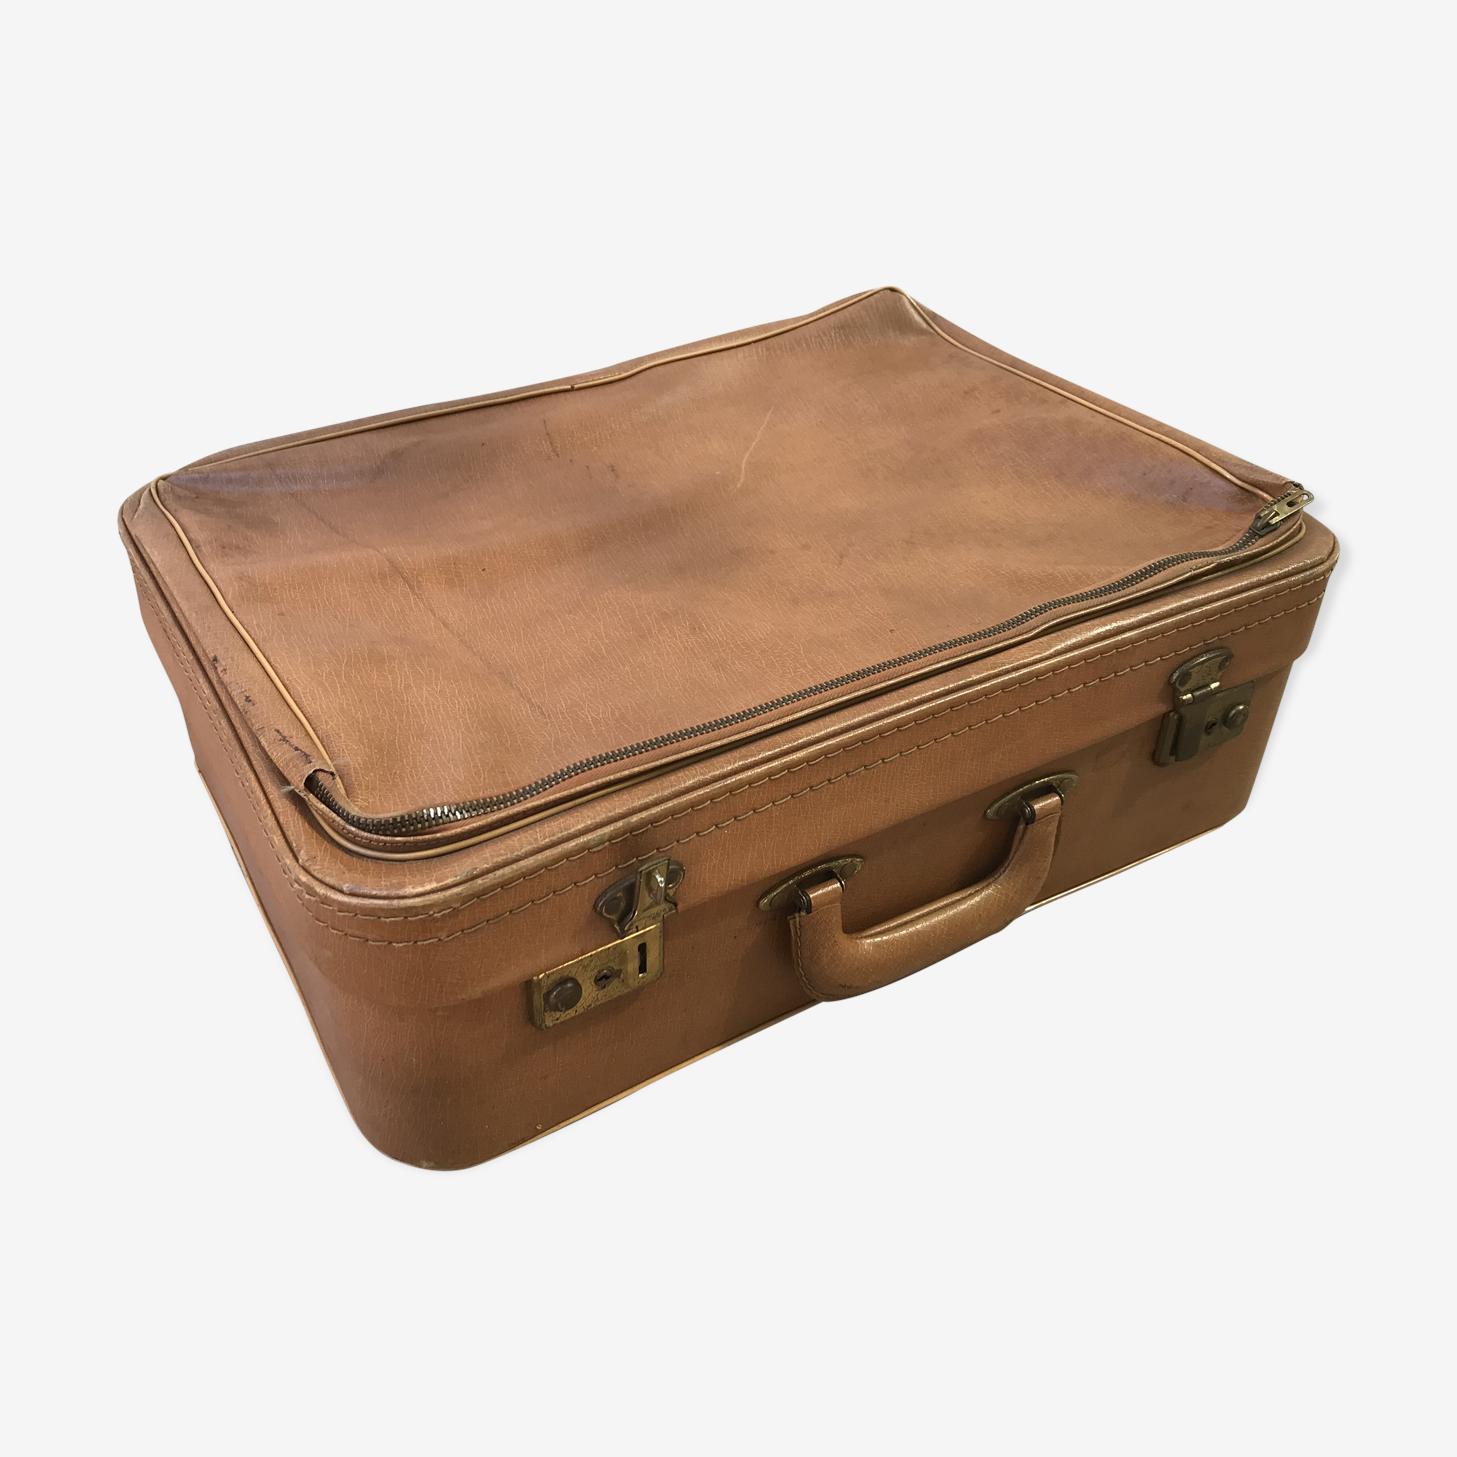 Ancienne valise cuir marron années 70 vintage